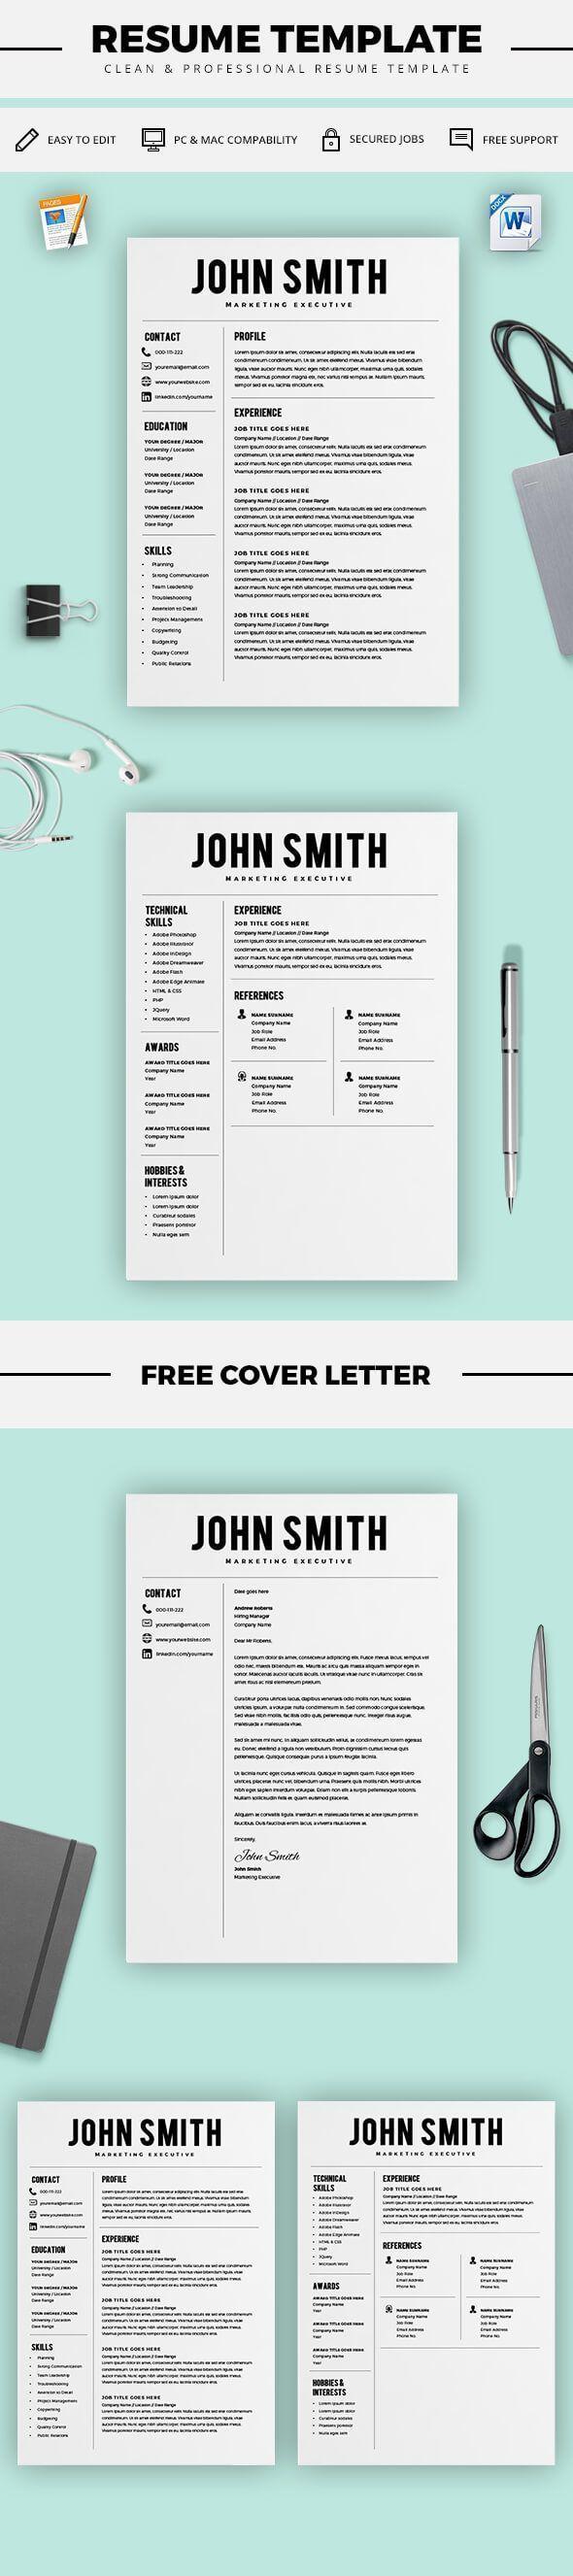 Resume Template - Resume Builder - CV Template + Cover Letter - MS ...